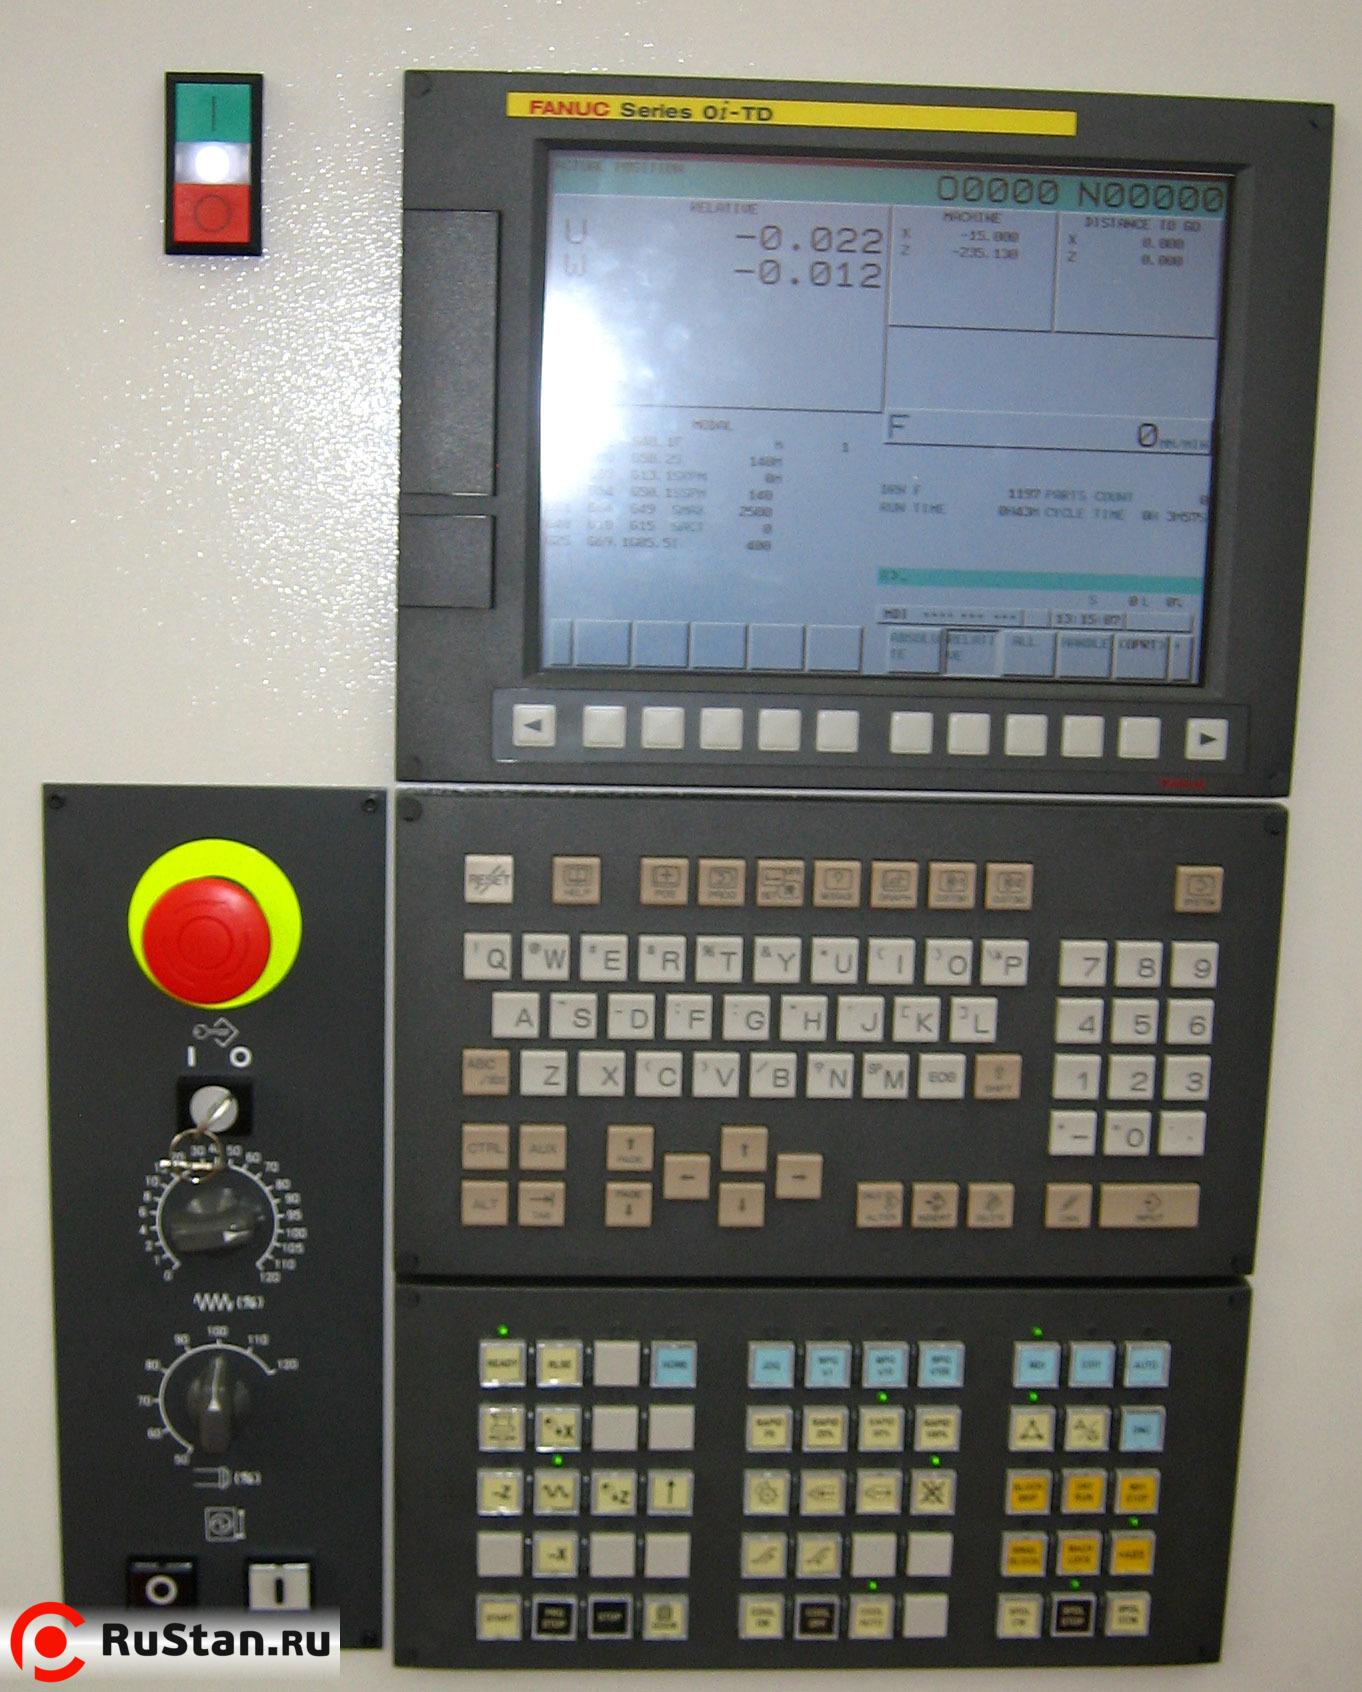 Структурная схема системы чпу мод fidia isograph